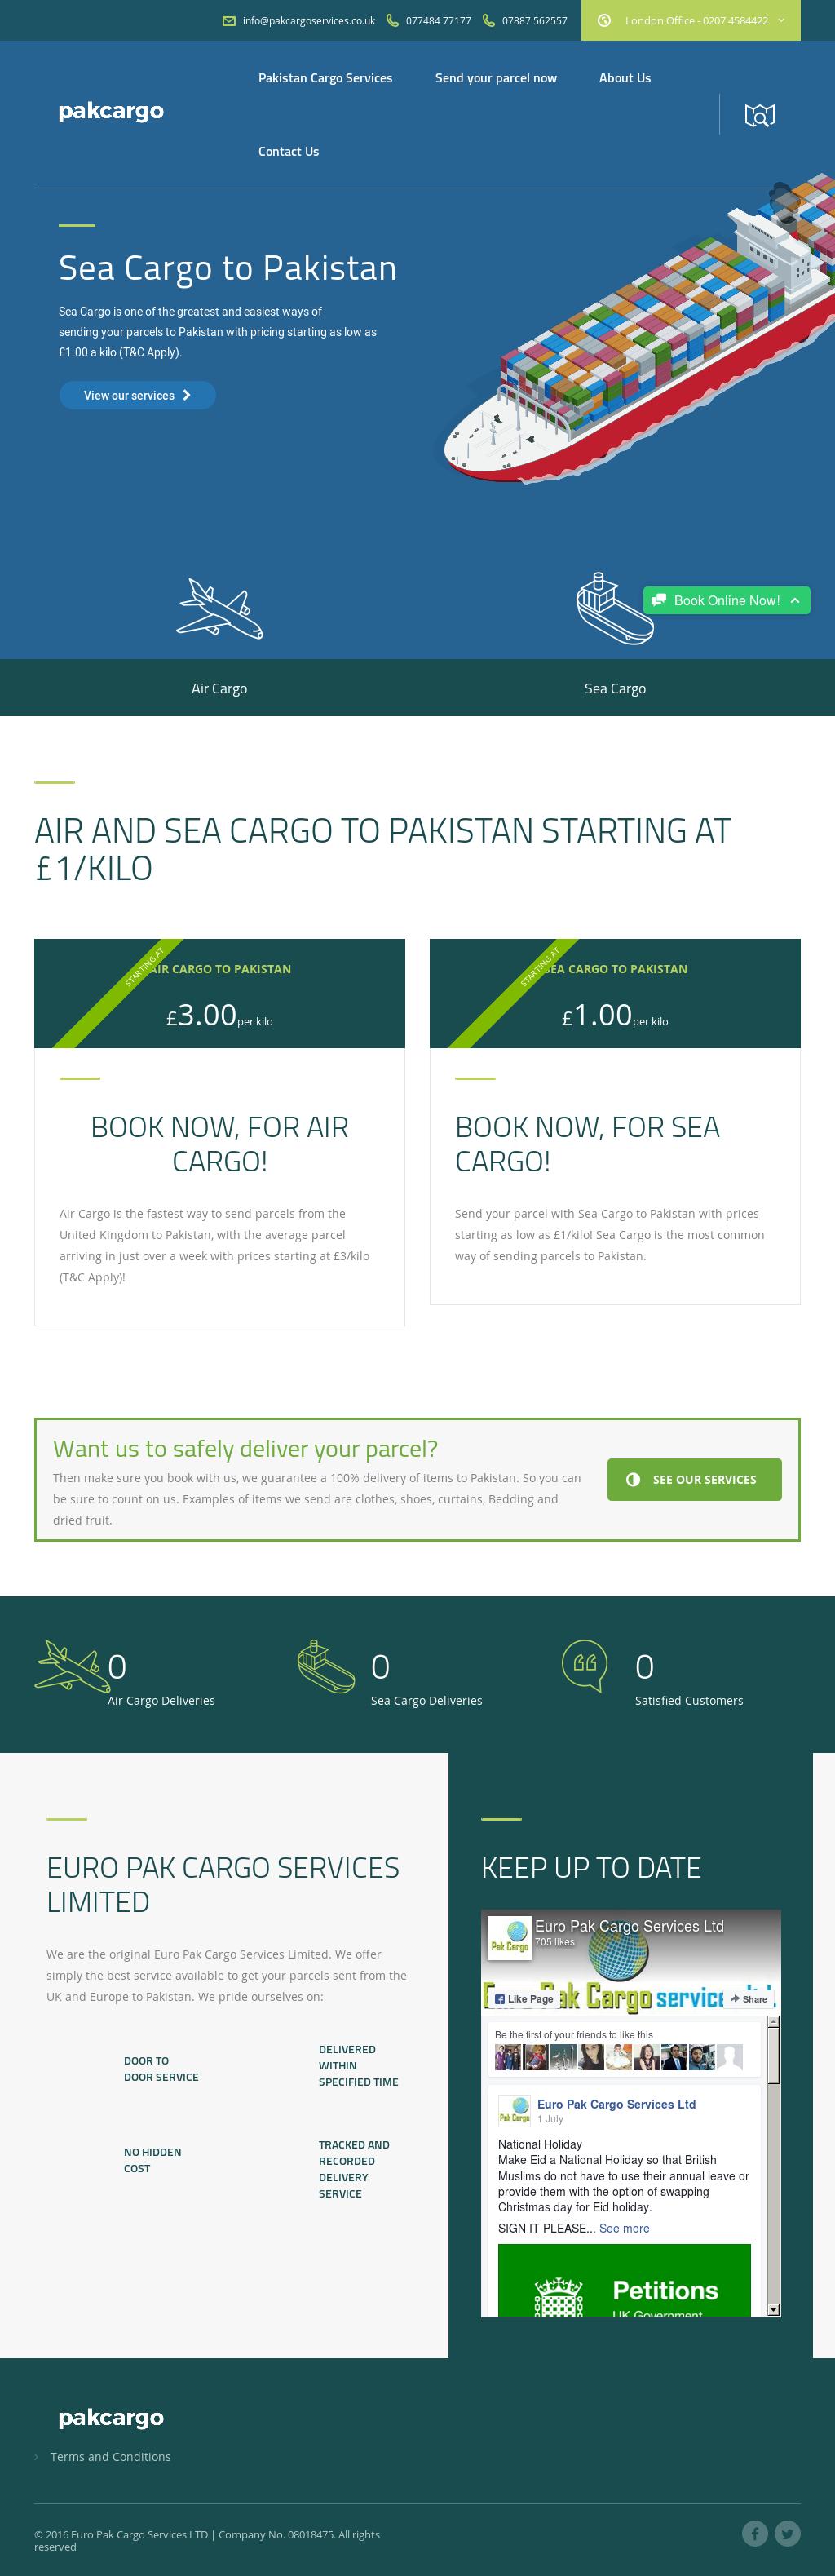 Euro Pak Cargo Express Service Competitors, Revenue and